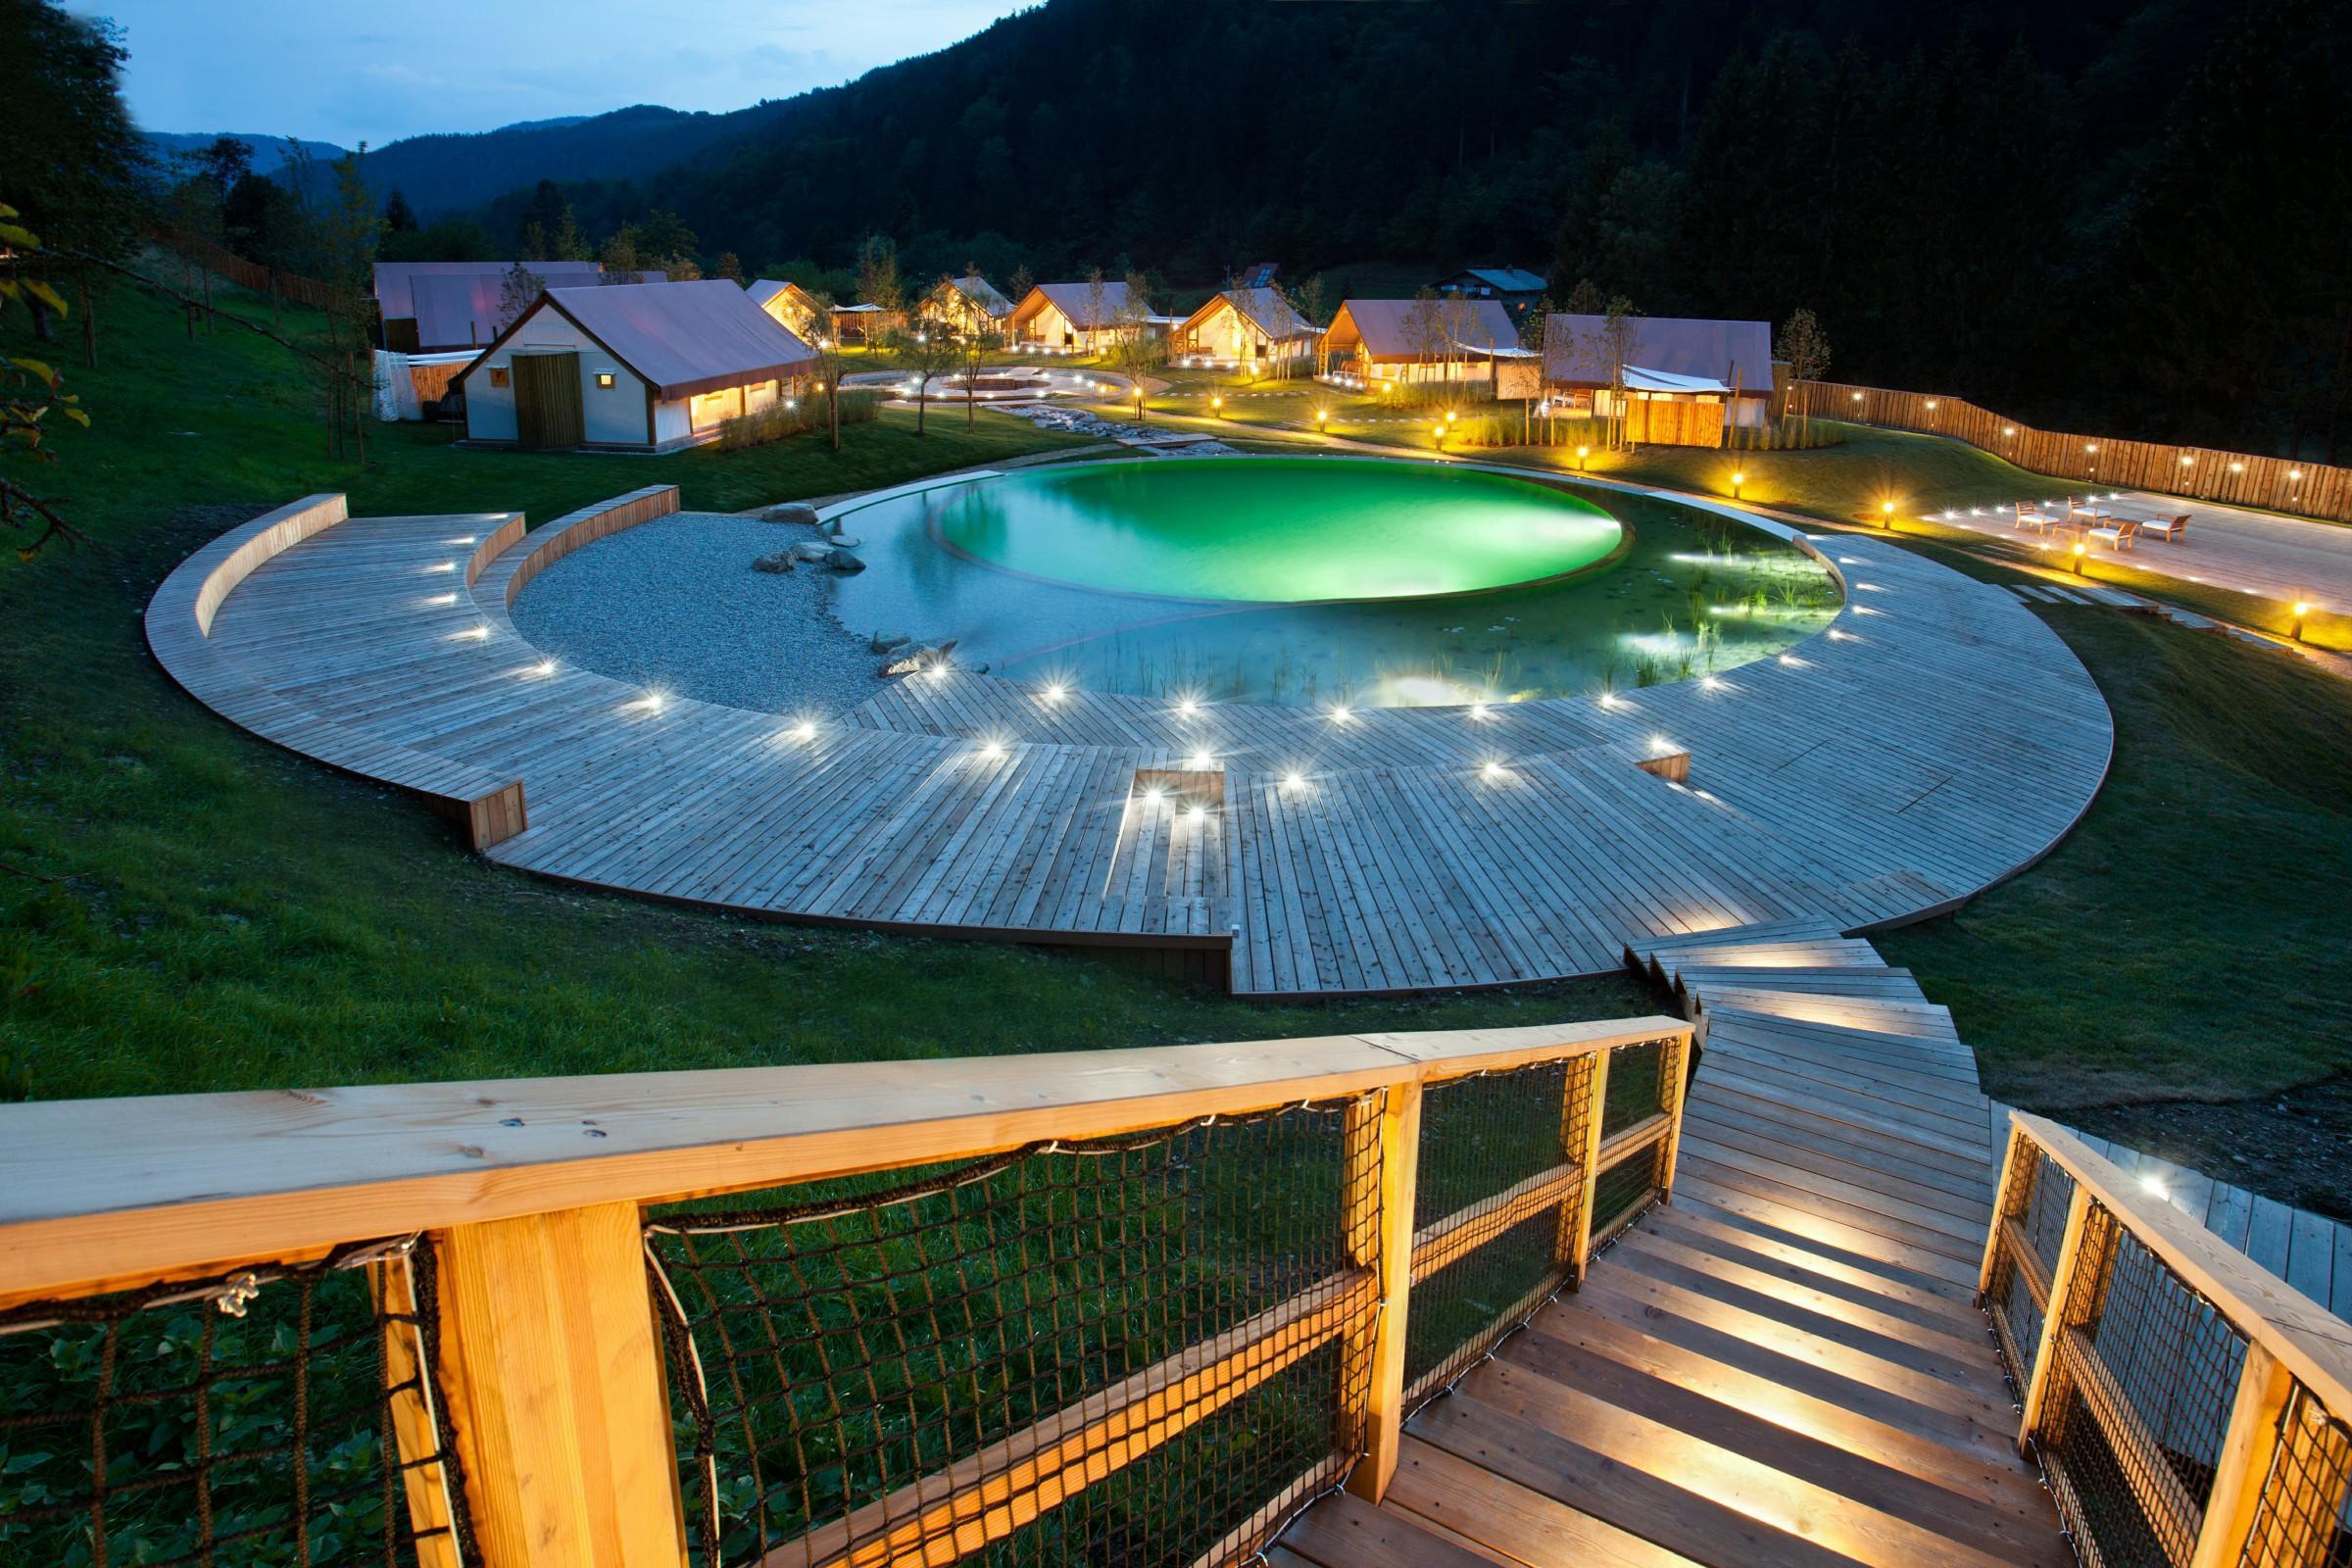 FormatFactoryCharming Herbal- Resort, foto Jost Gantar, Savinjska dolina